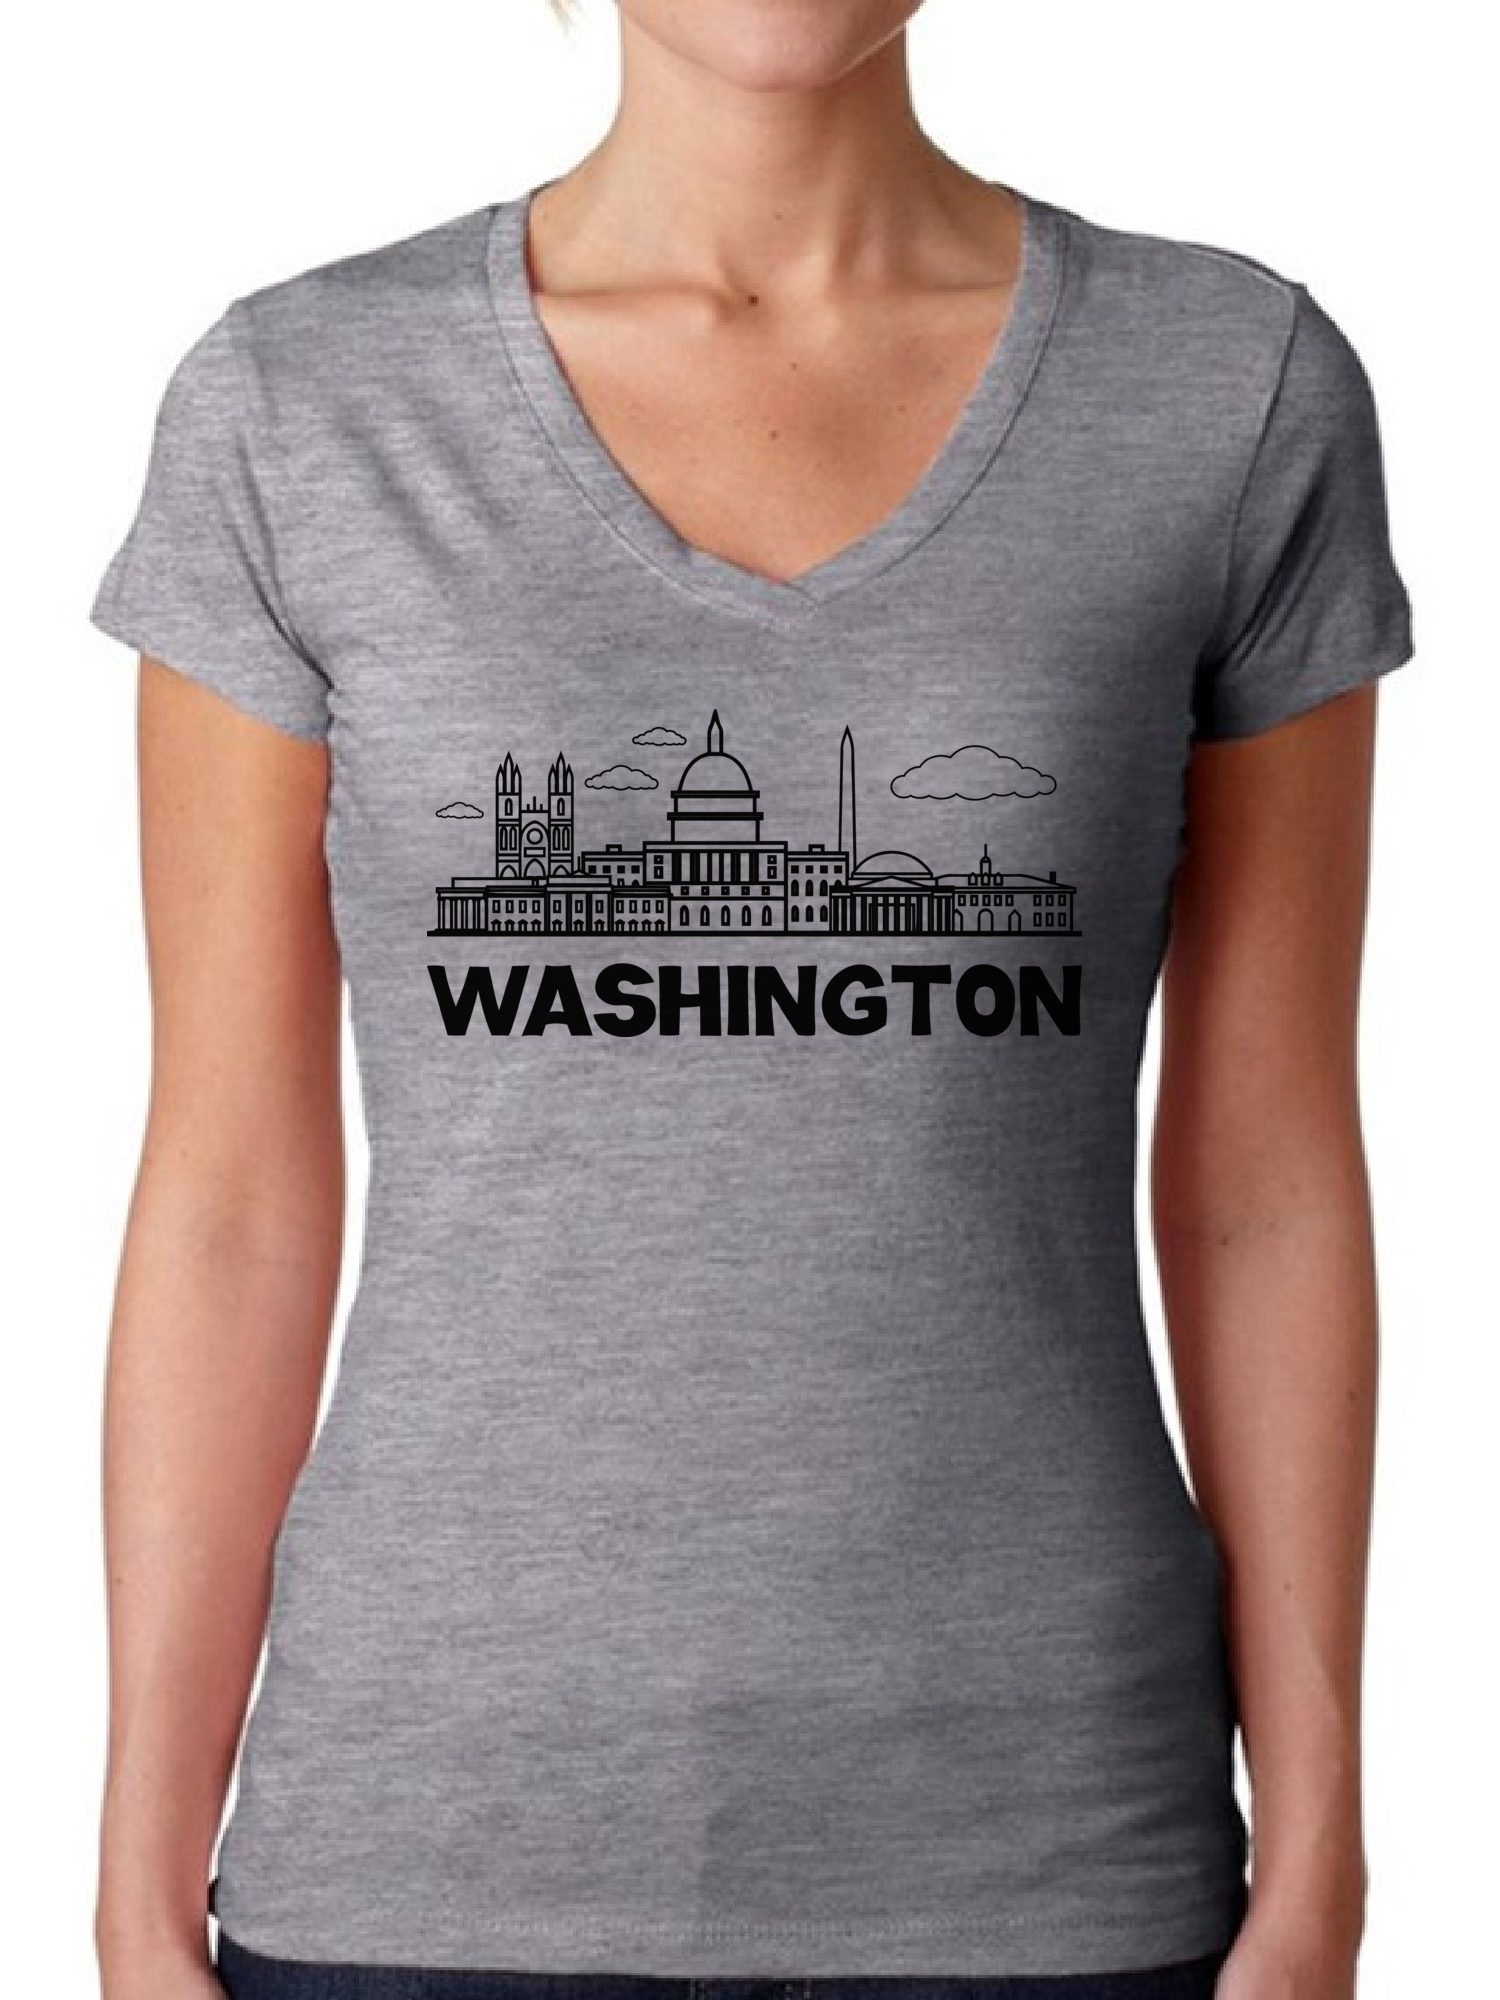 Washington, DC Flag Long Sleeve T-Shirt – State Traditions